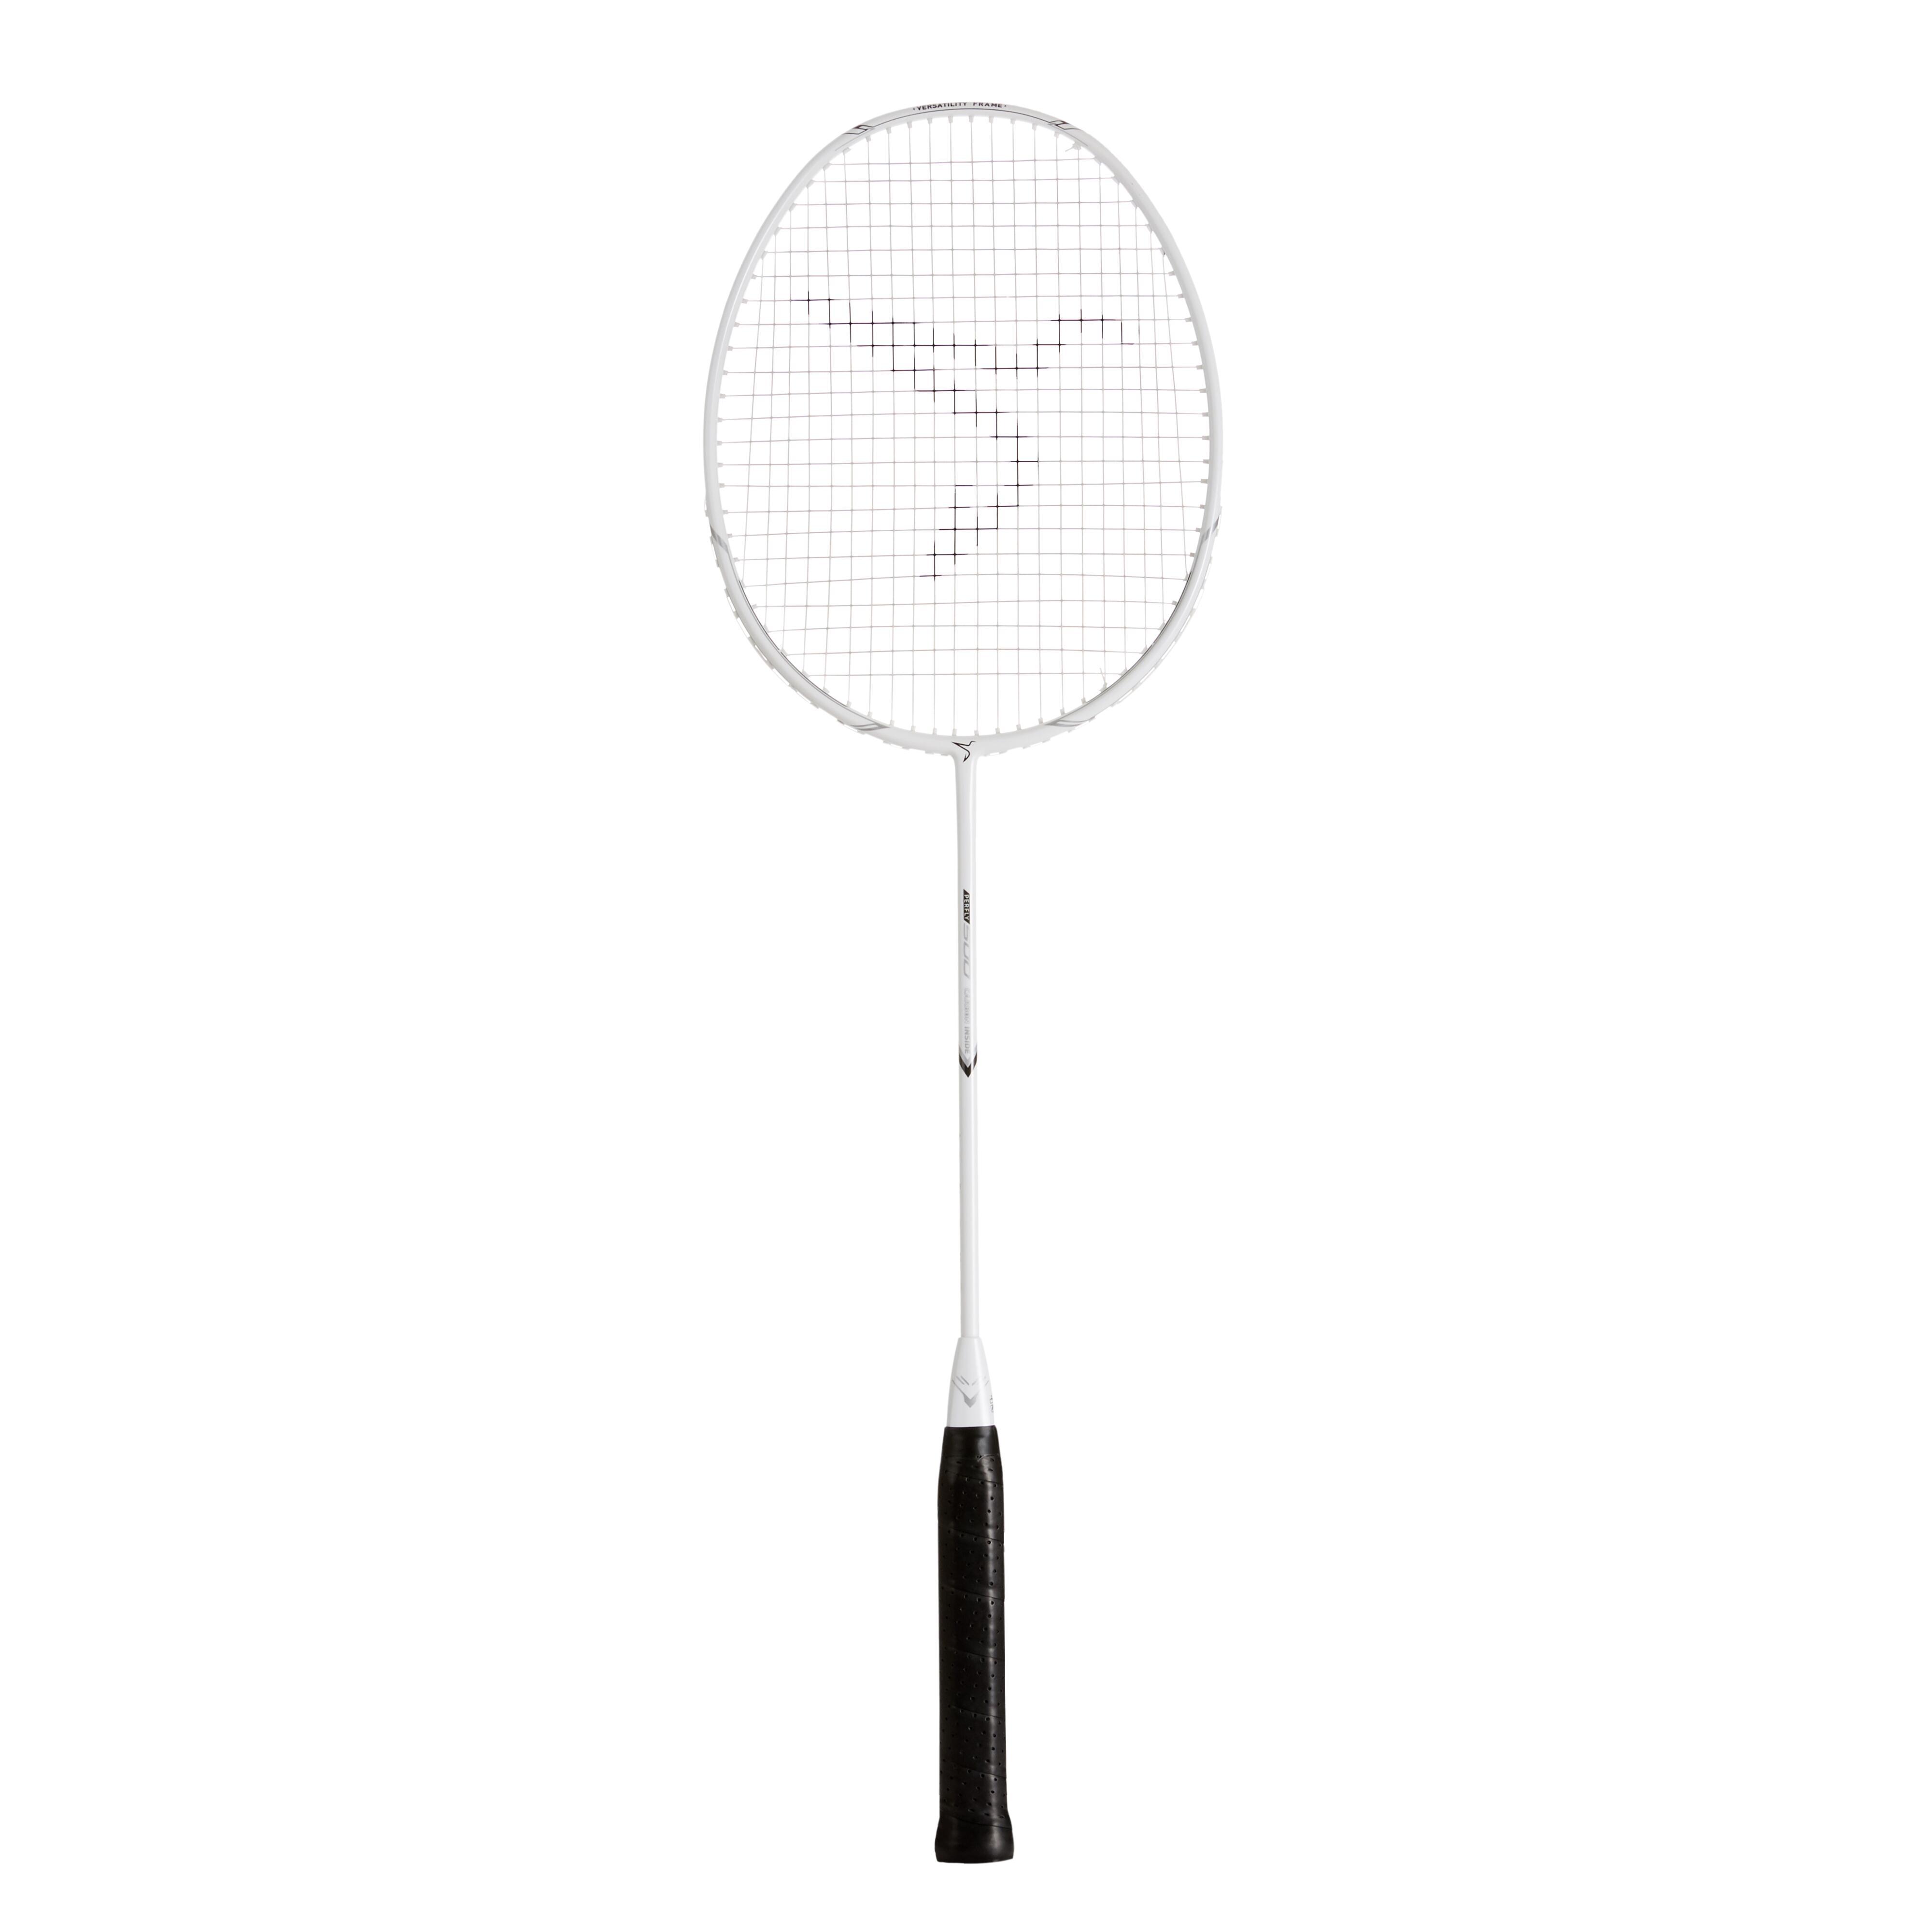 Rachetă Badminton BR500 Adulţi imagine